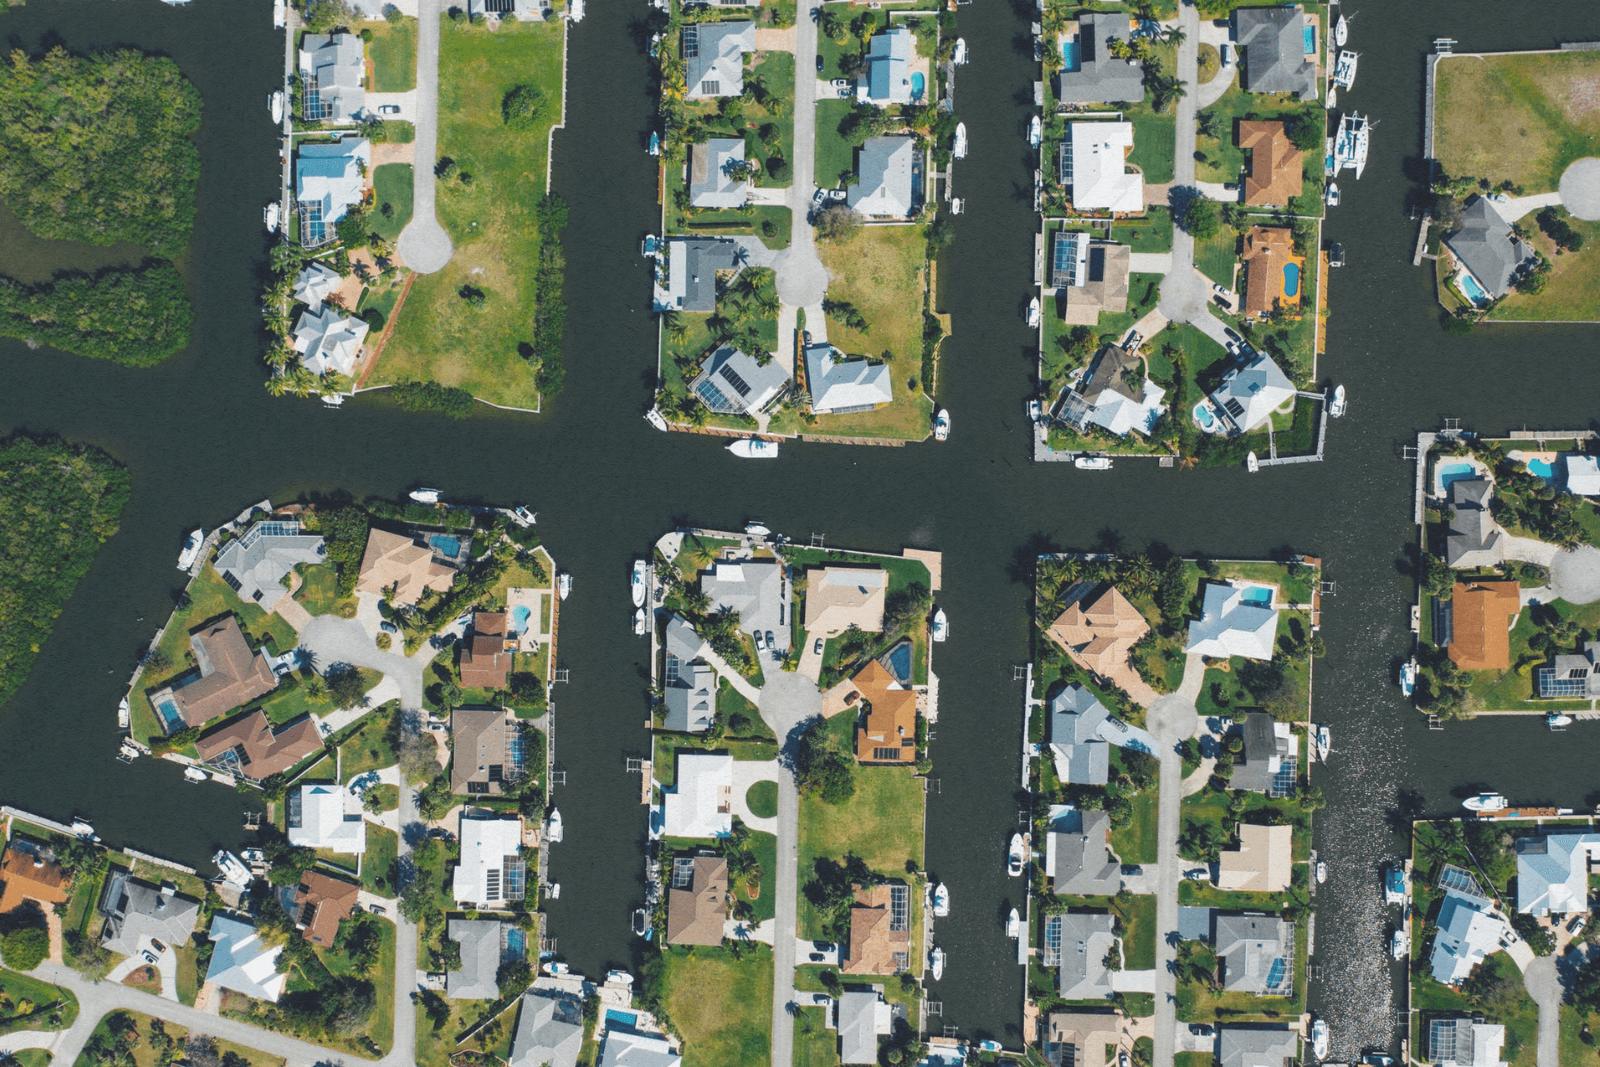 neighborhood from aerial view